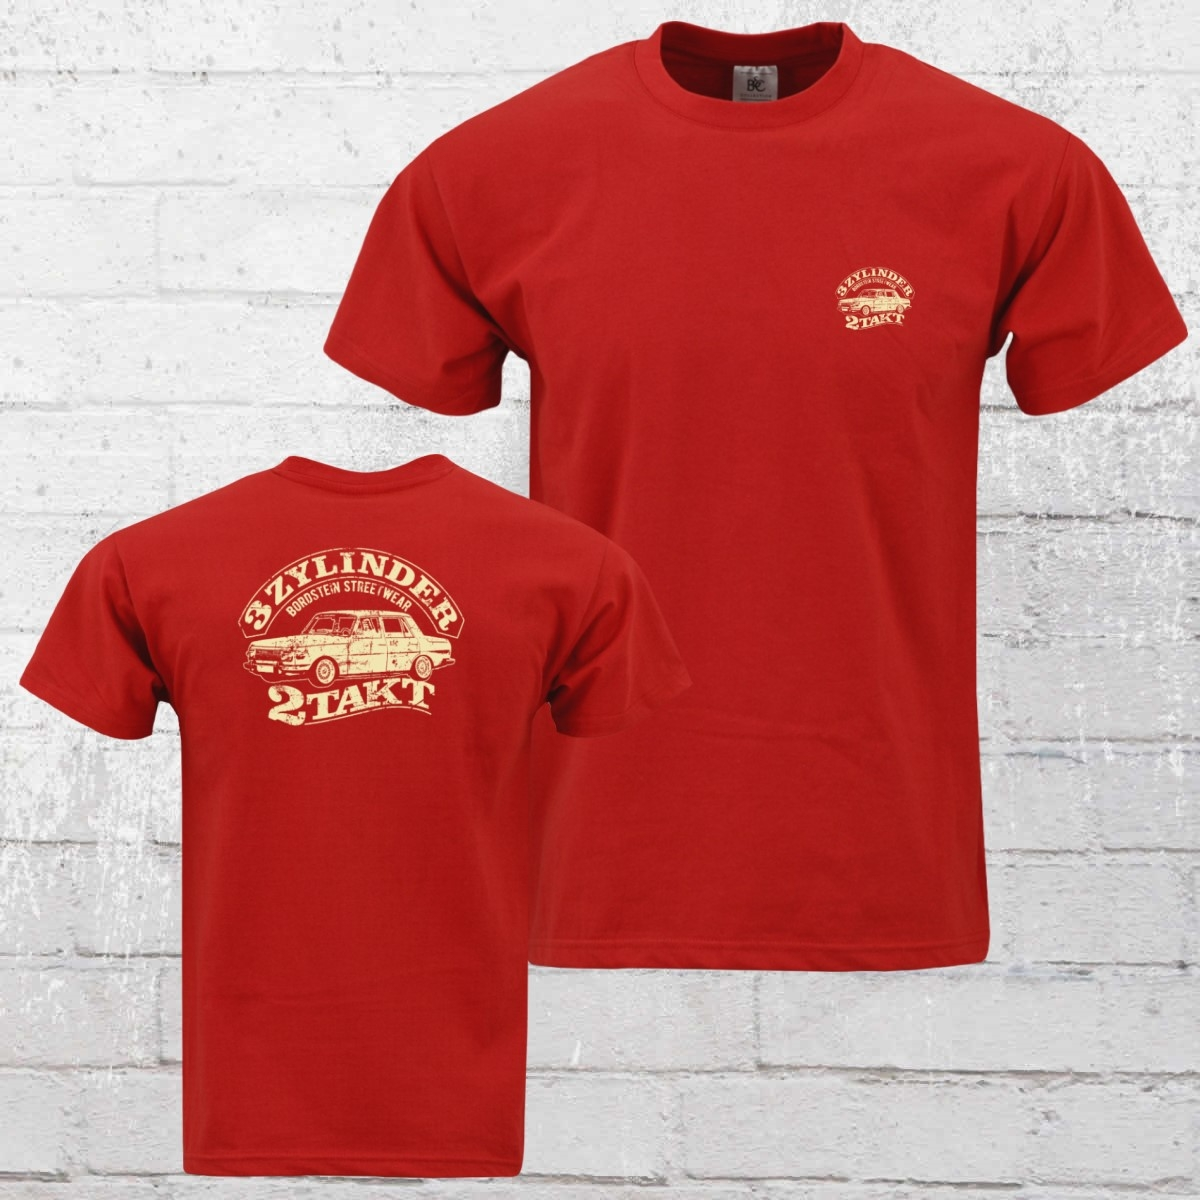 Bordstein Herren T-Shirt 3 Zylinder 2-Takt 2 rot